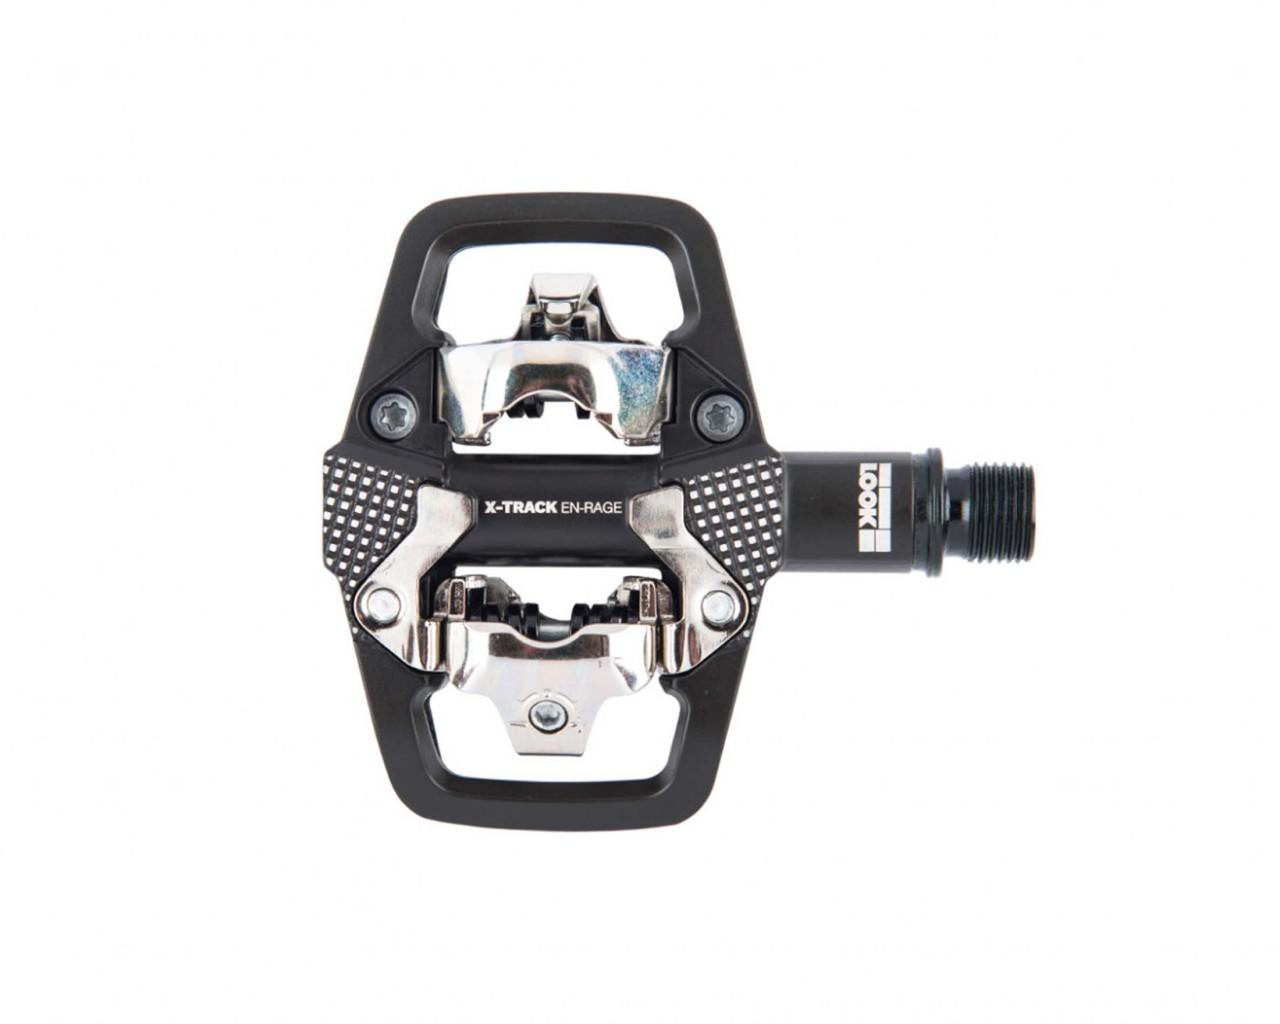 Look X-Track EN-Rage Pedals | black